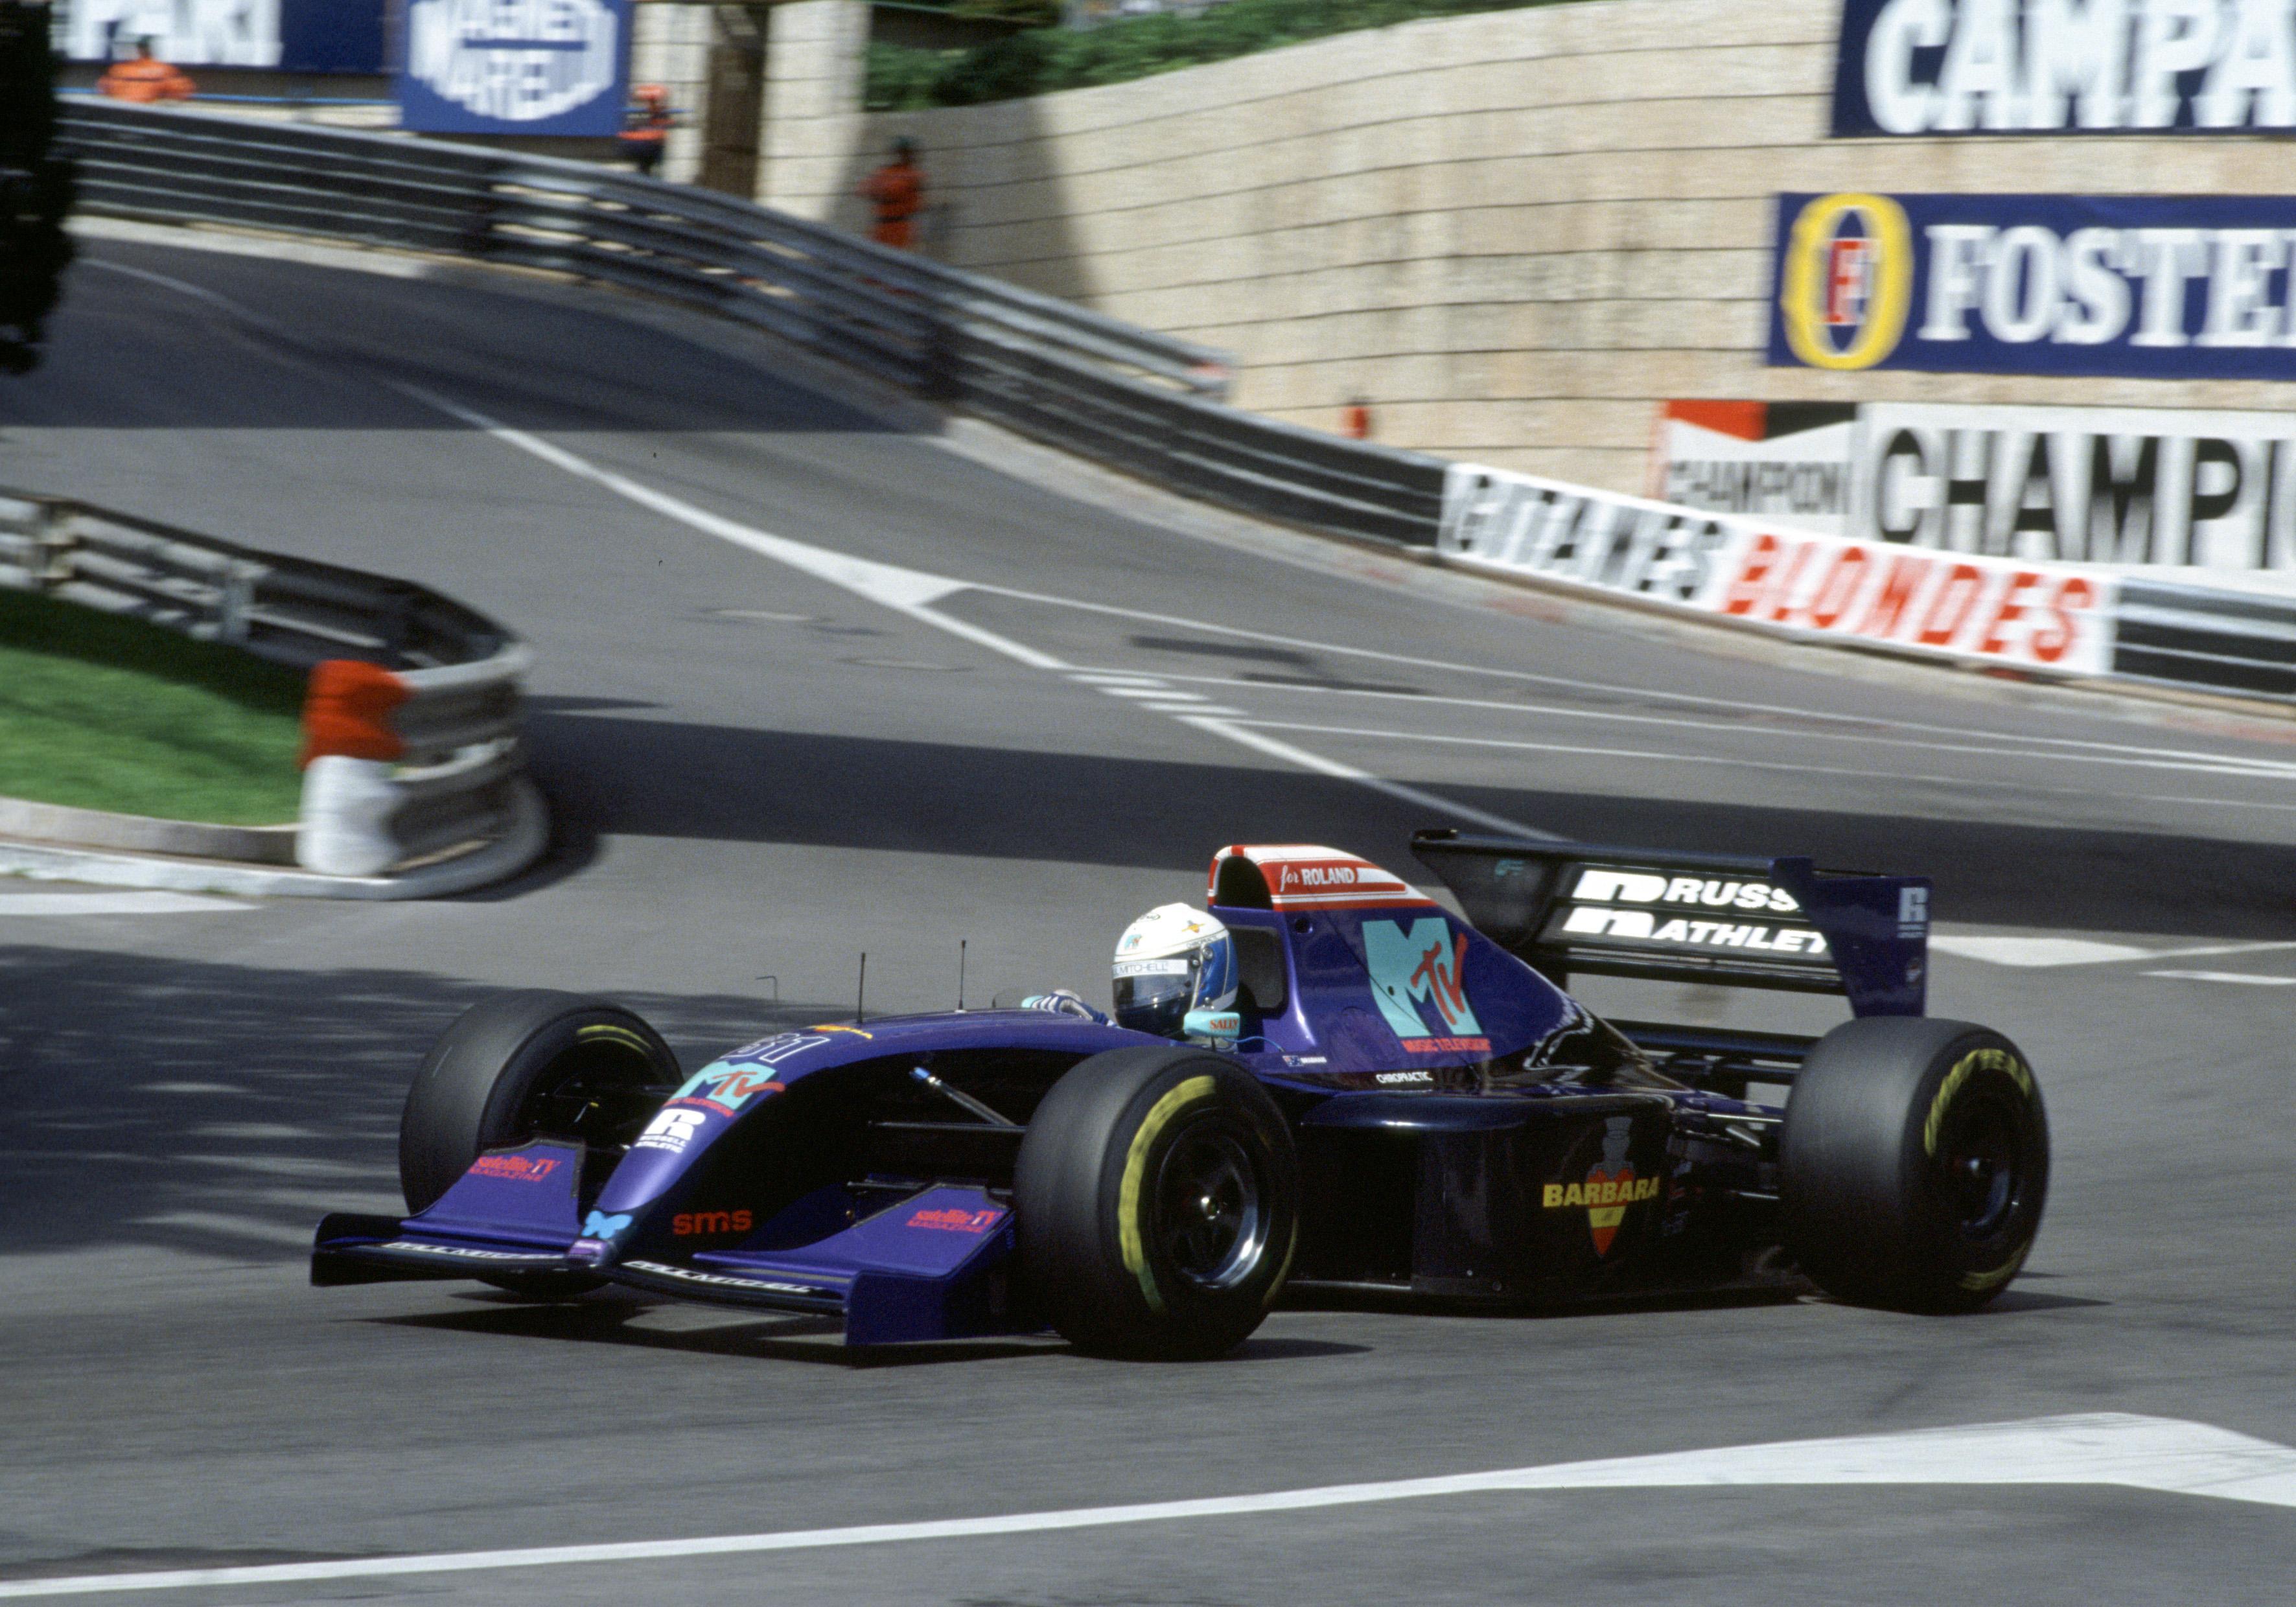 David Brabham Simtek Monaco Grand Prix 1994